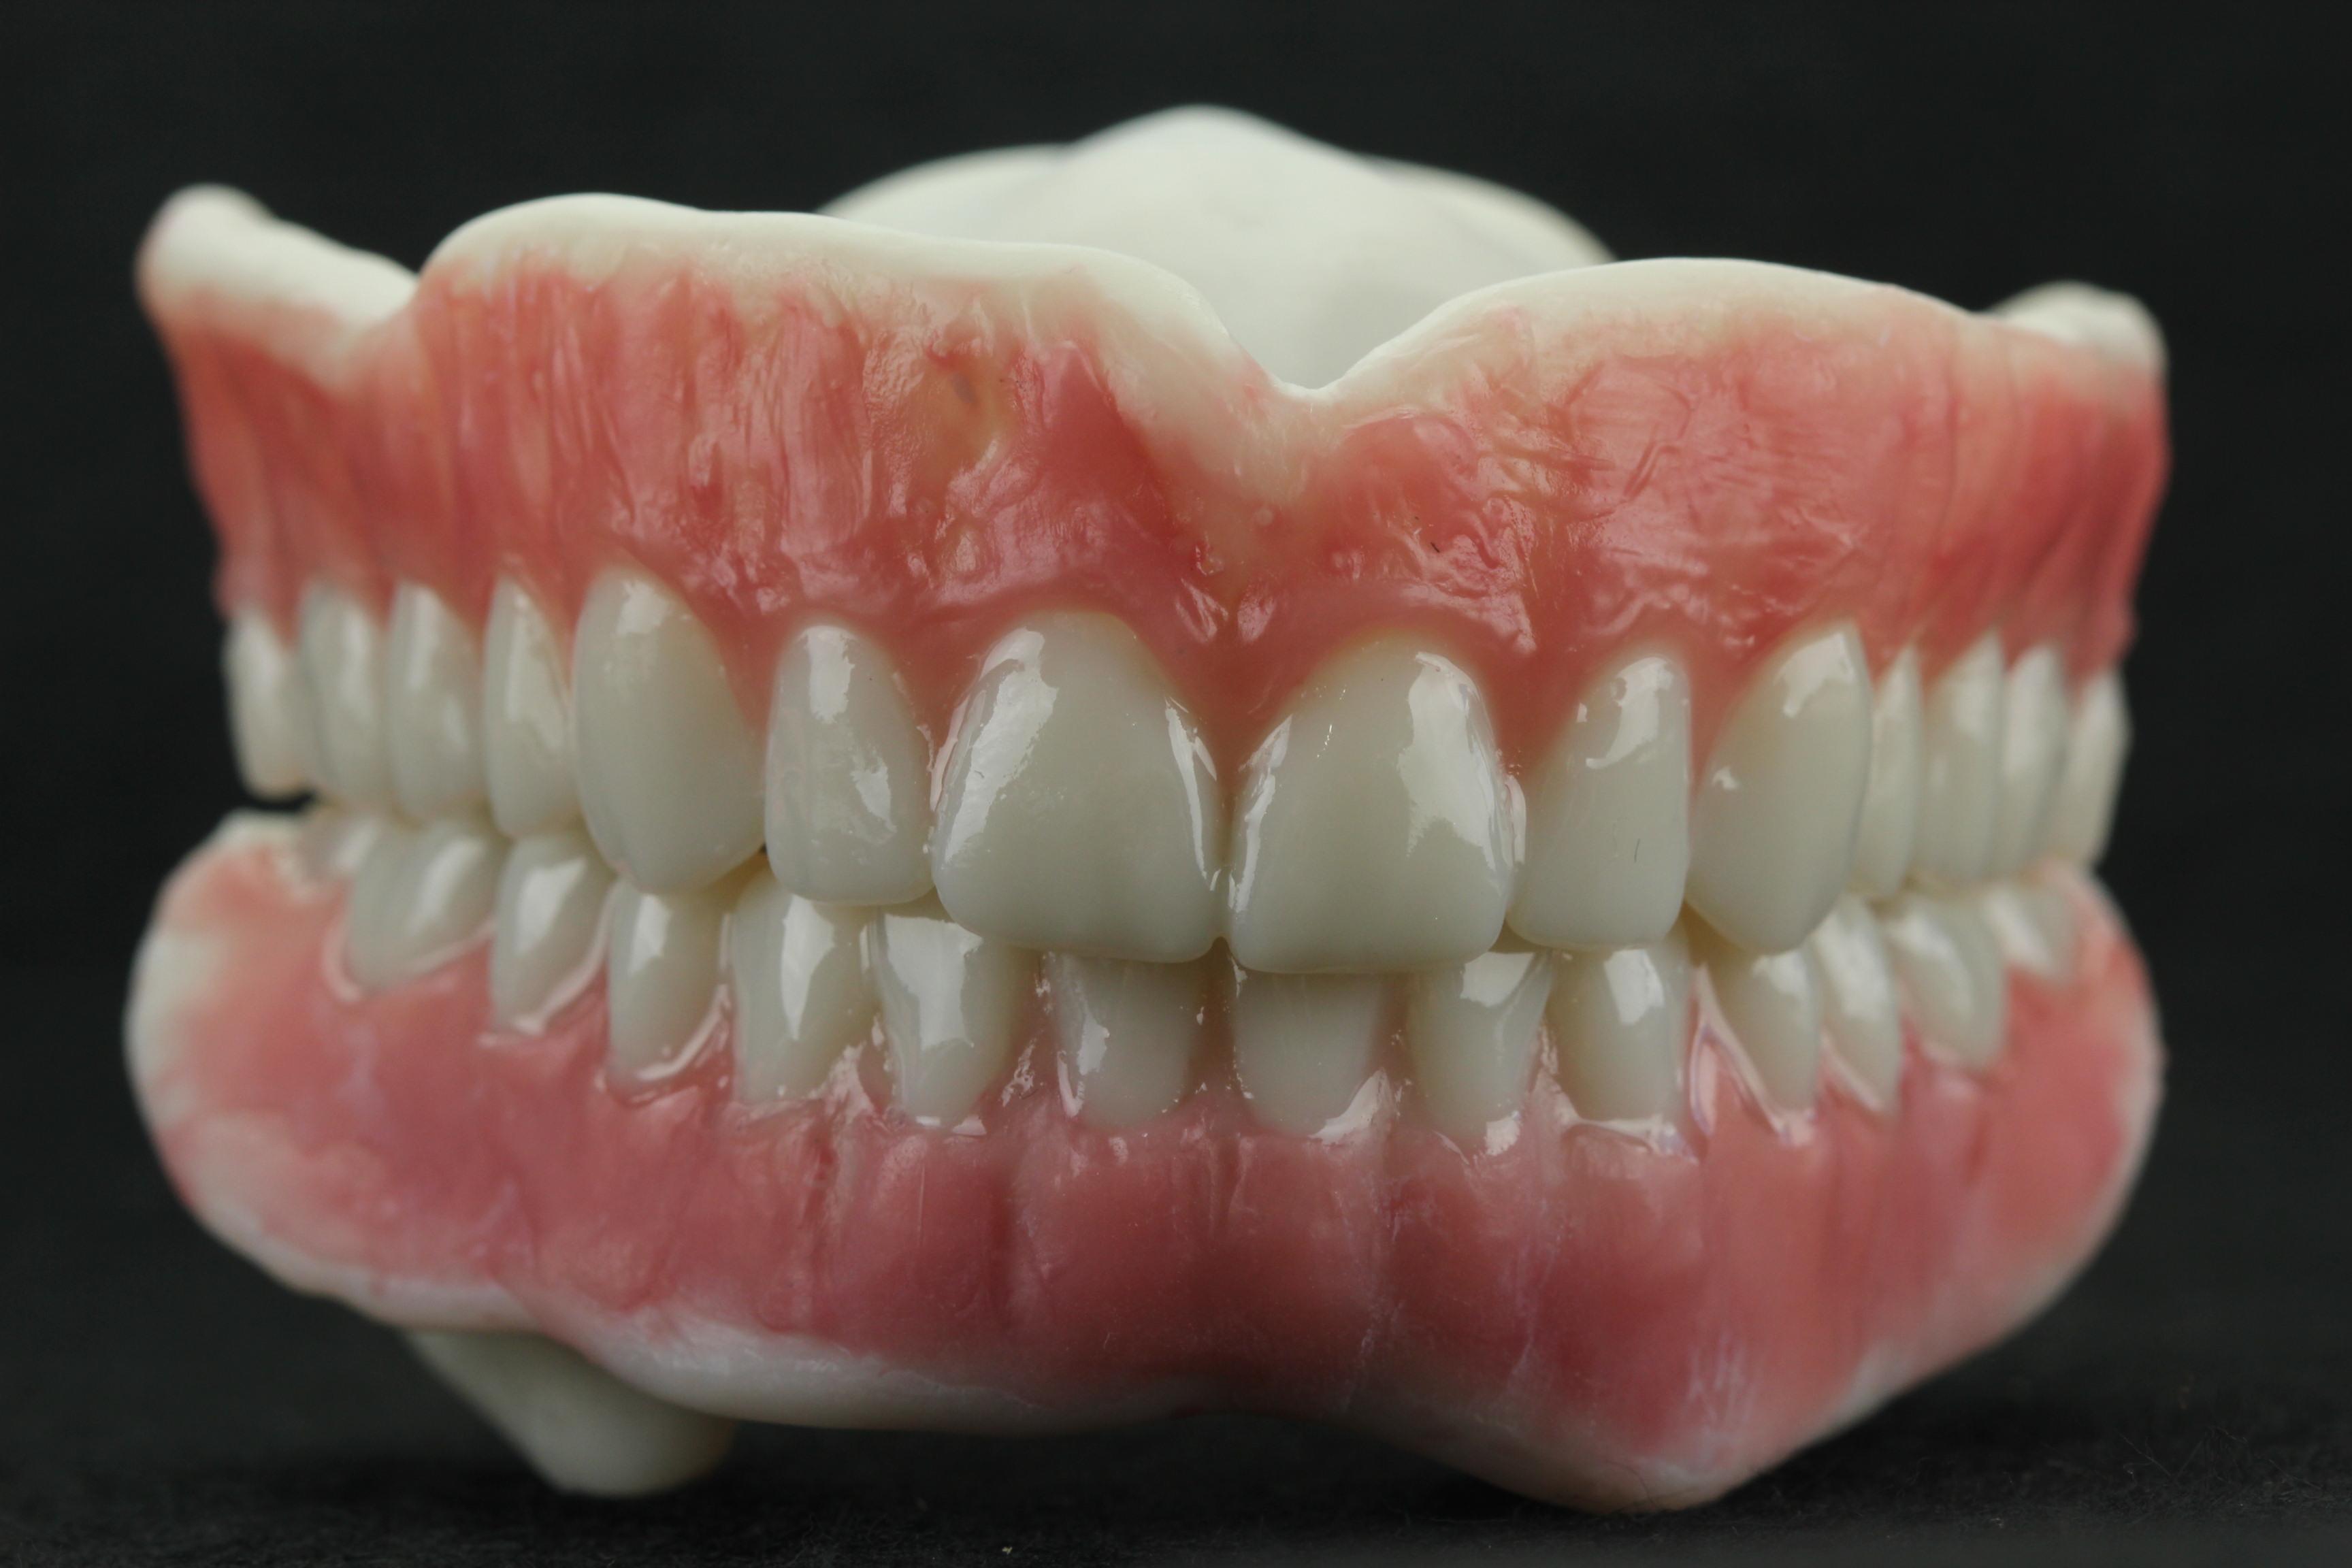 Monolithic denture with gingiva